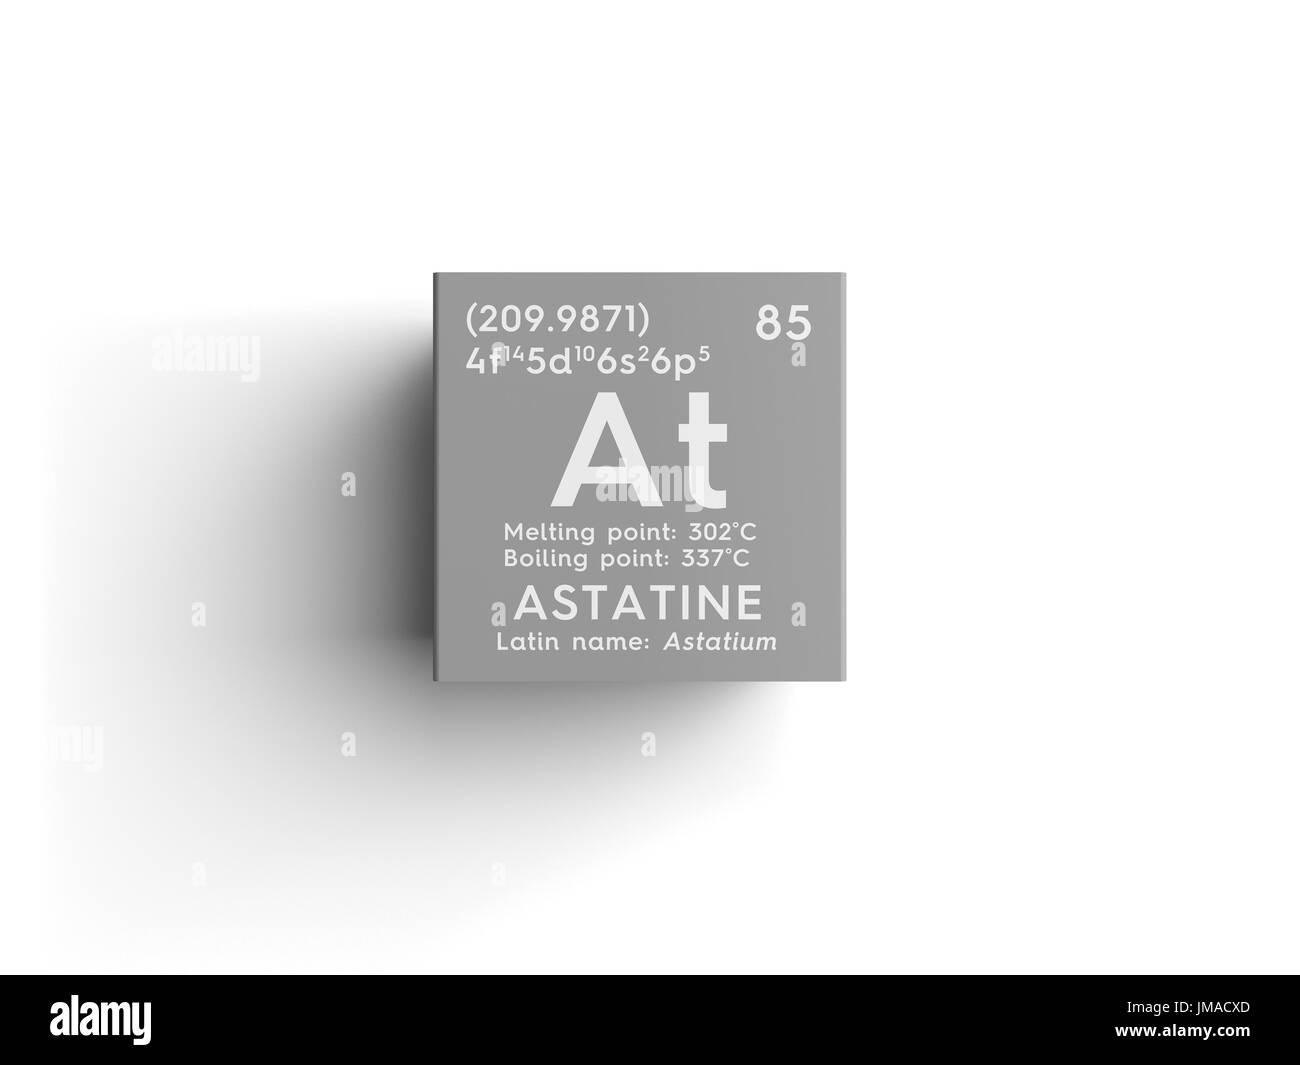 Astatine astatium los halgenos elemento qumico de la tabla los halgenos elemento qumico de la tabla peridica de mendeleyev en astatine square cube concepto creativo urtaz Choice Image